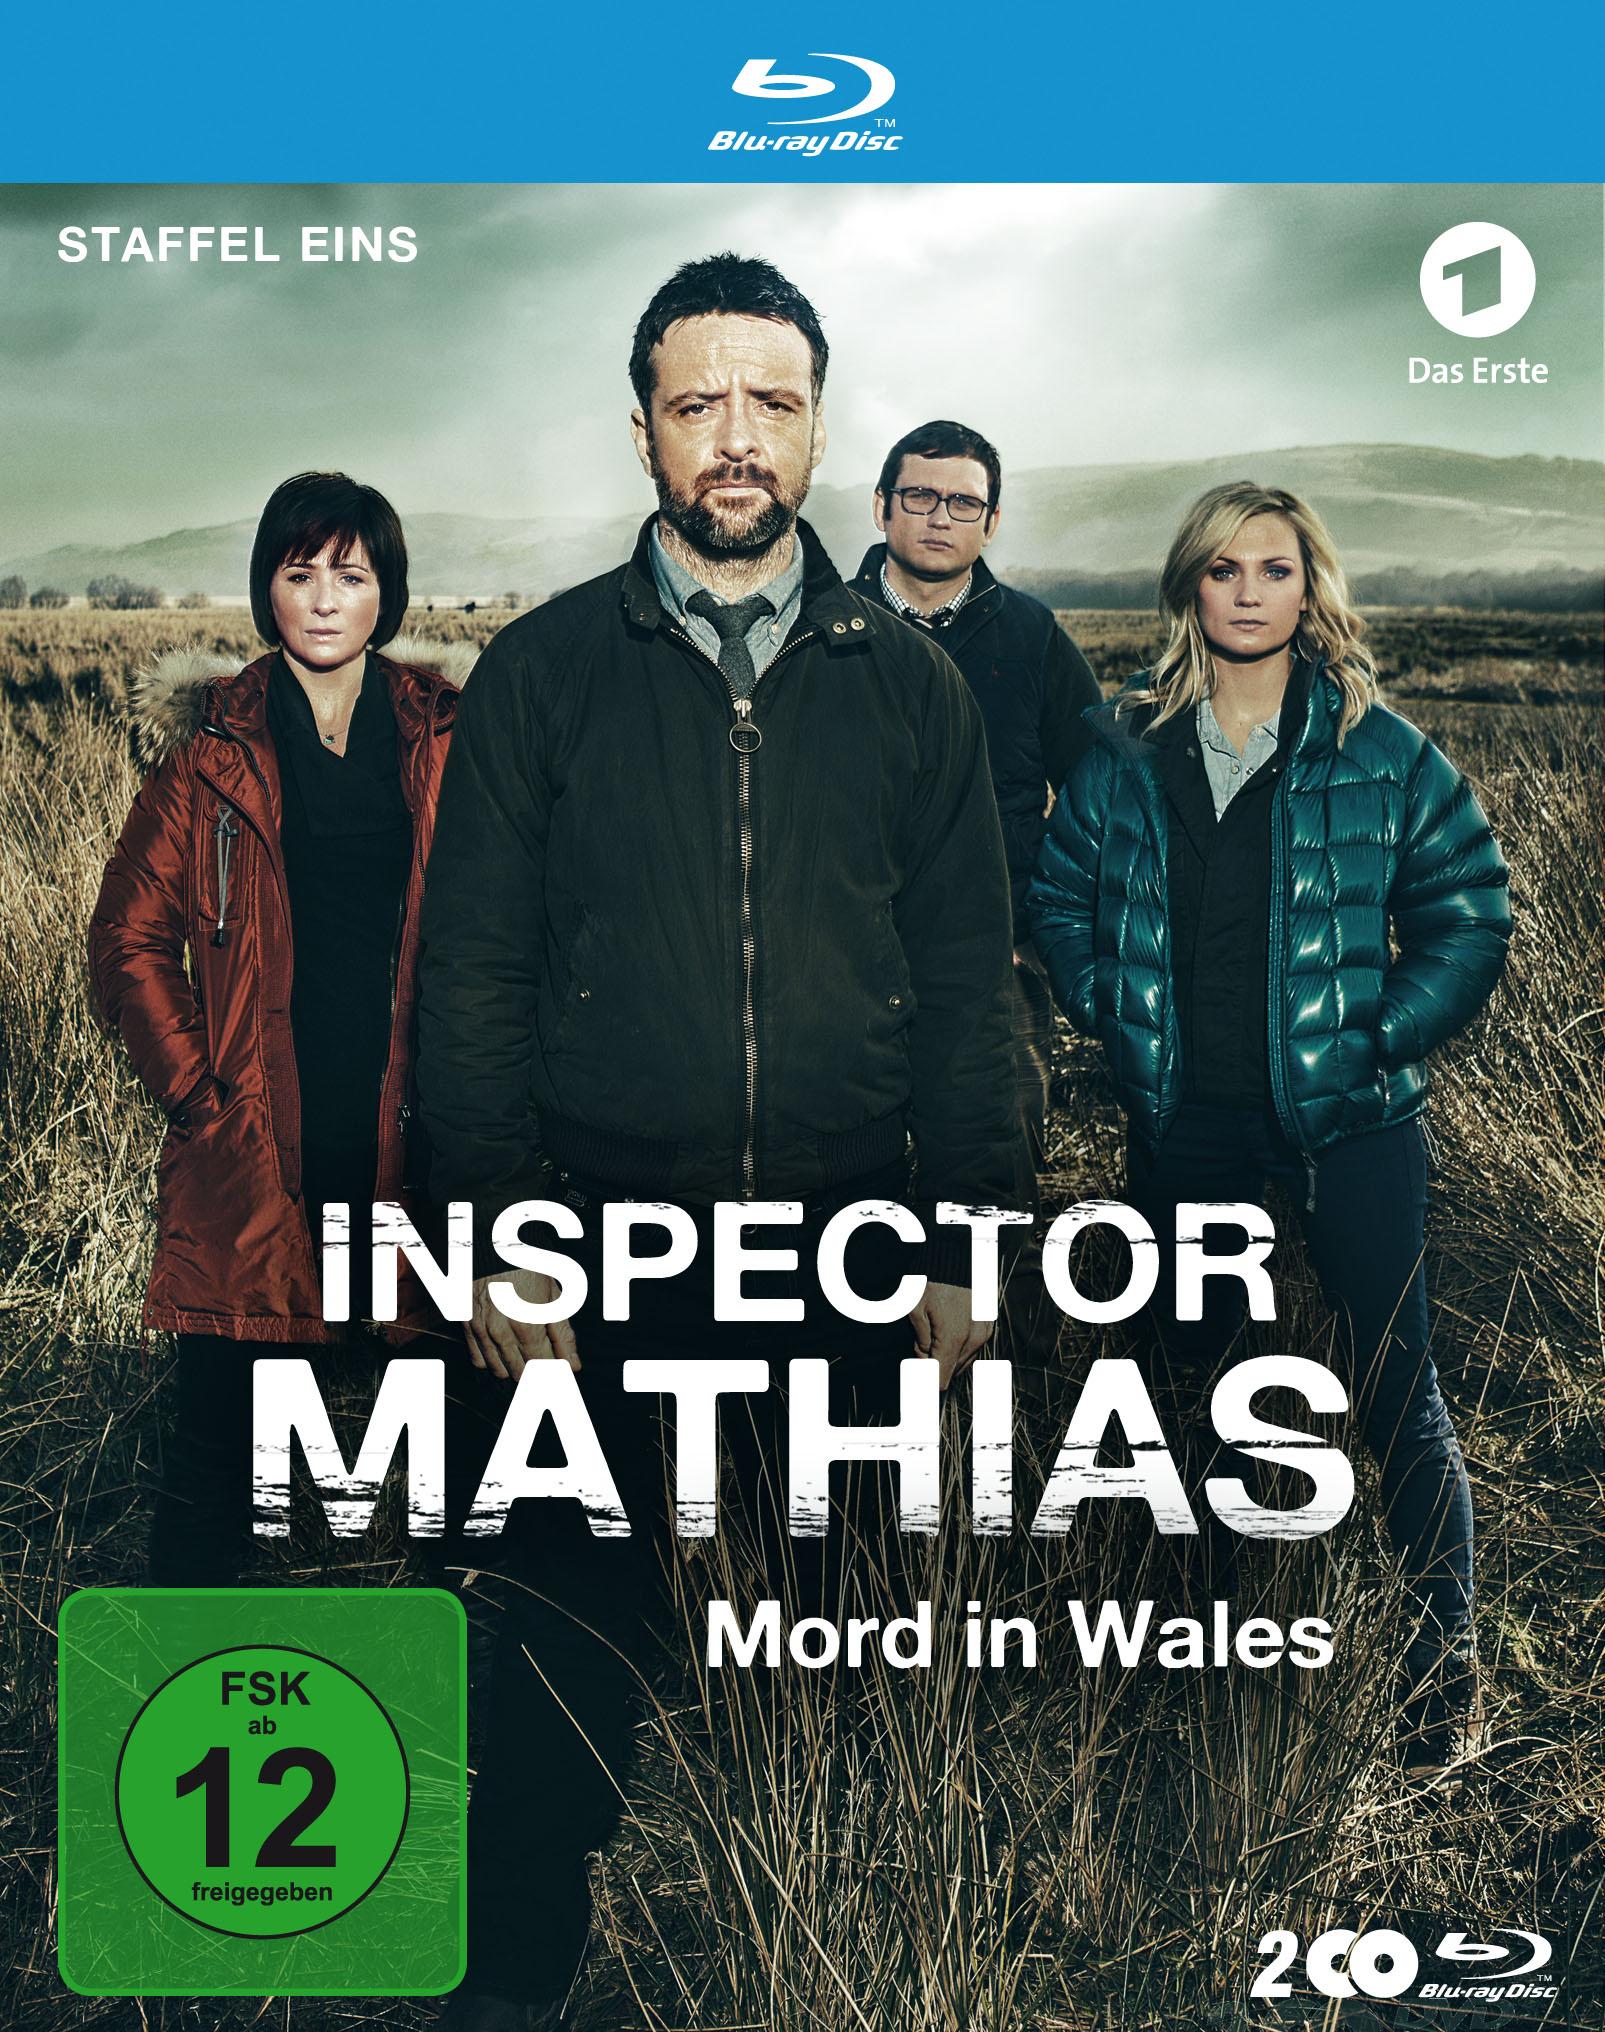 Inspector Mathias – Mord in Wales (TV-Serie, DVD/Blu-Ray)